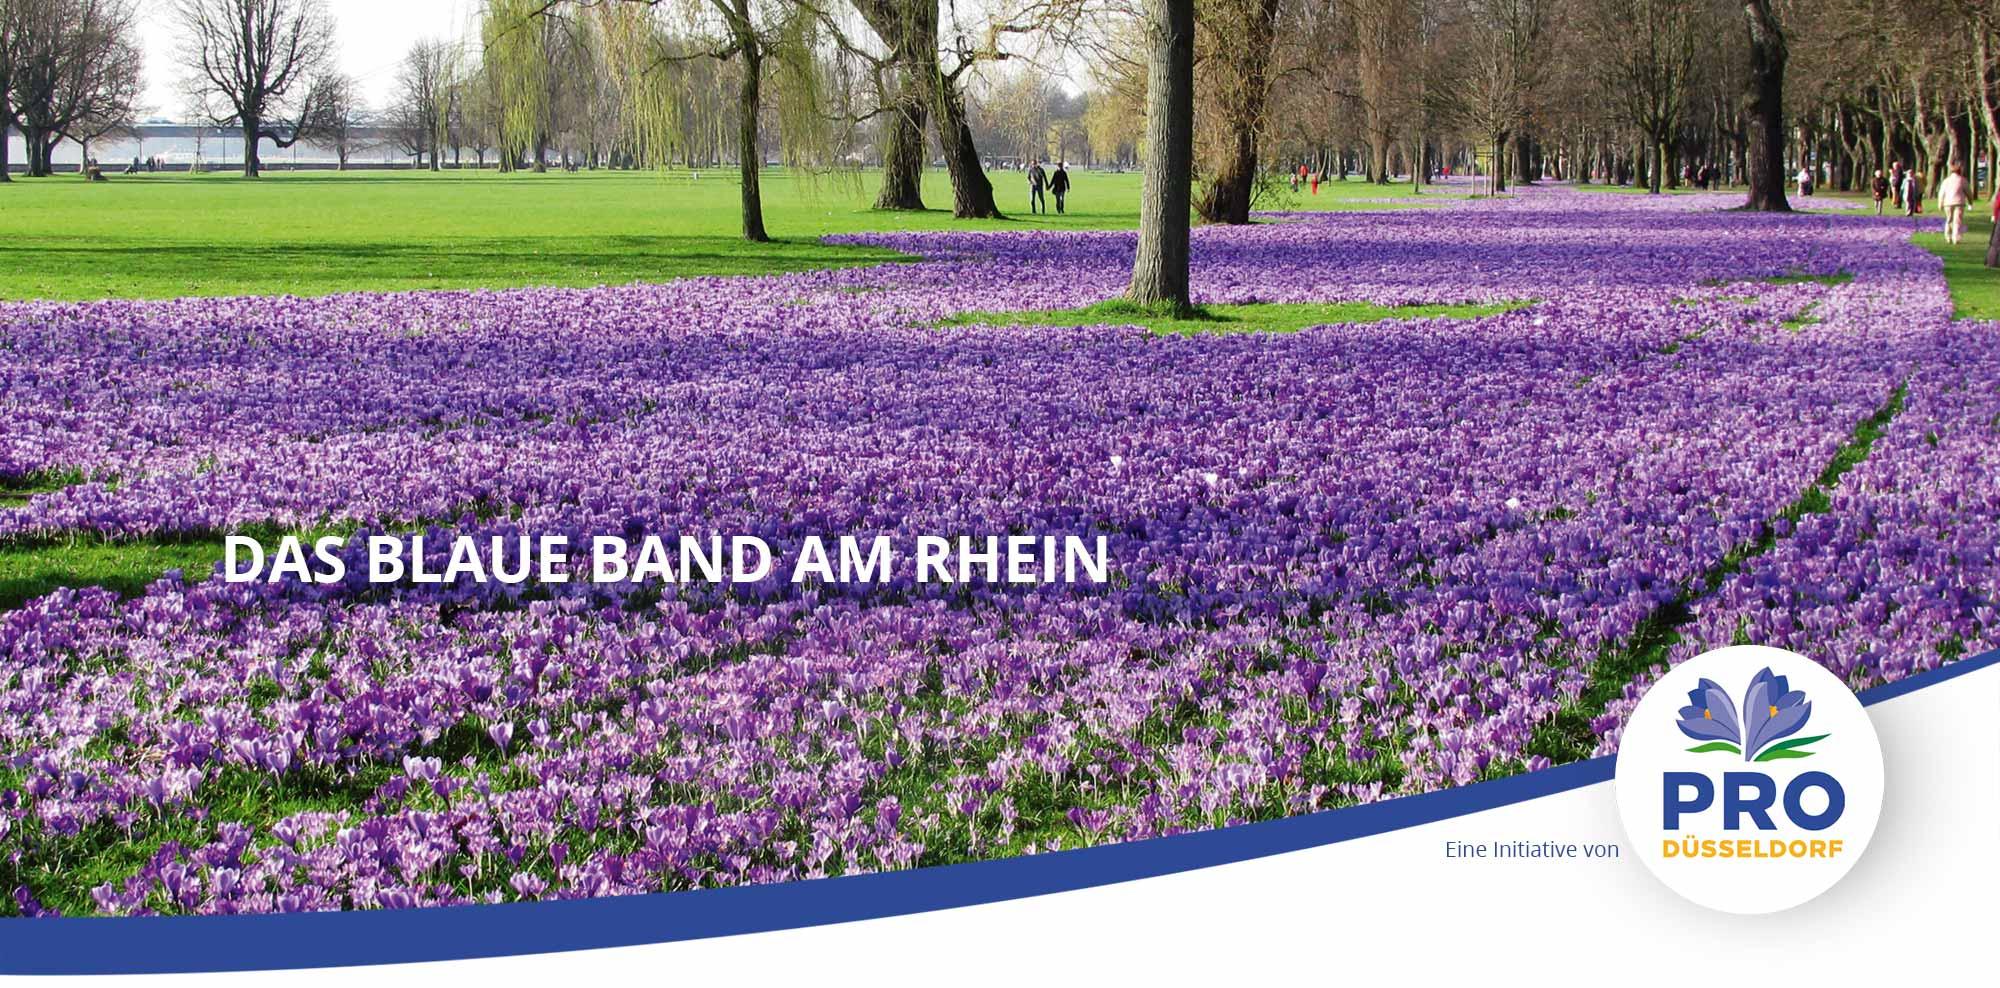 Das Blaue Band / Krokusfelder im Rheinpark